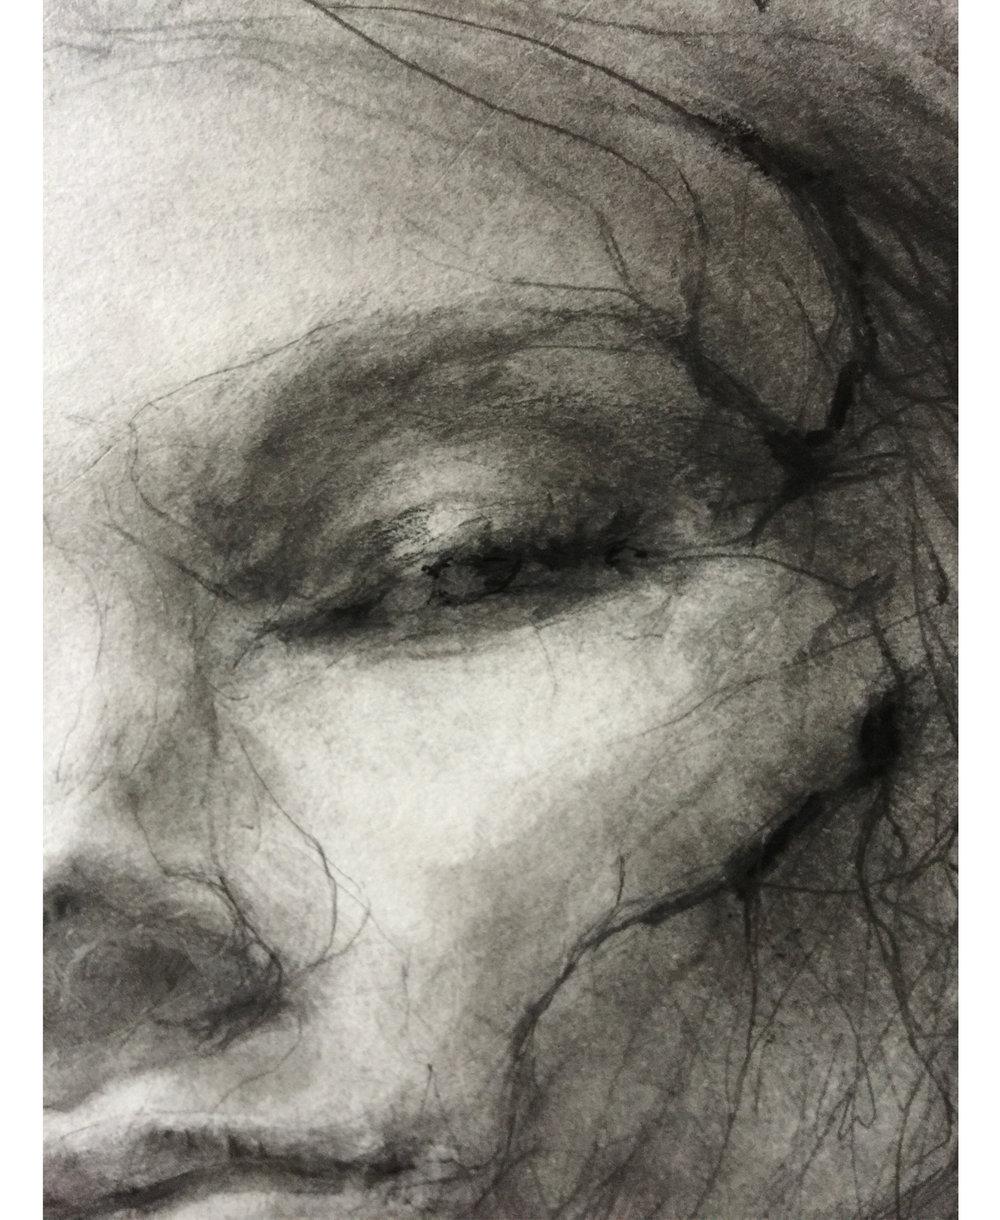 Selfportrait 1/17, detail